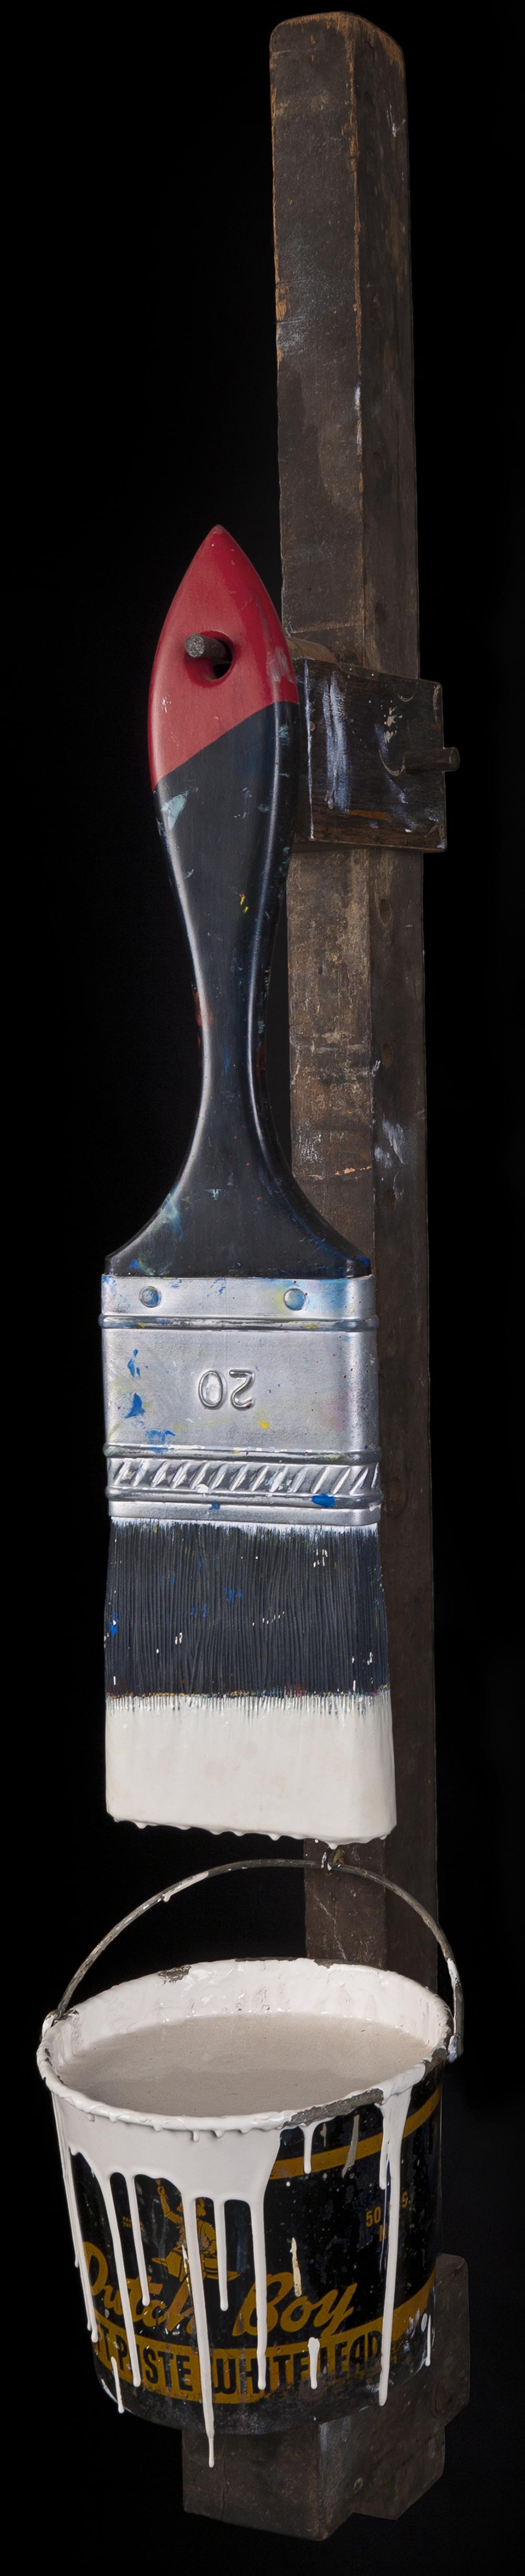 Drip Rack, 2012, 58 x 9 x 13 (Sold)